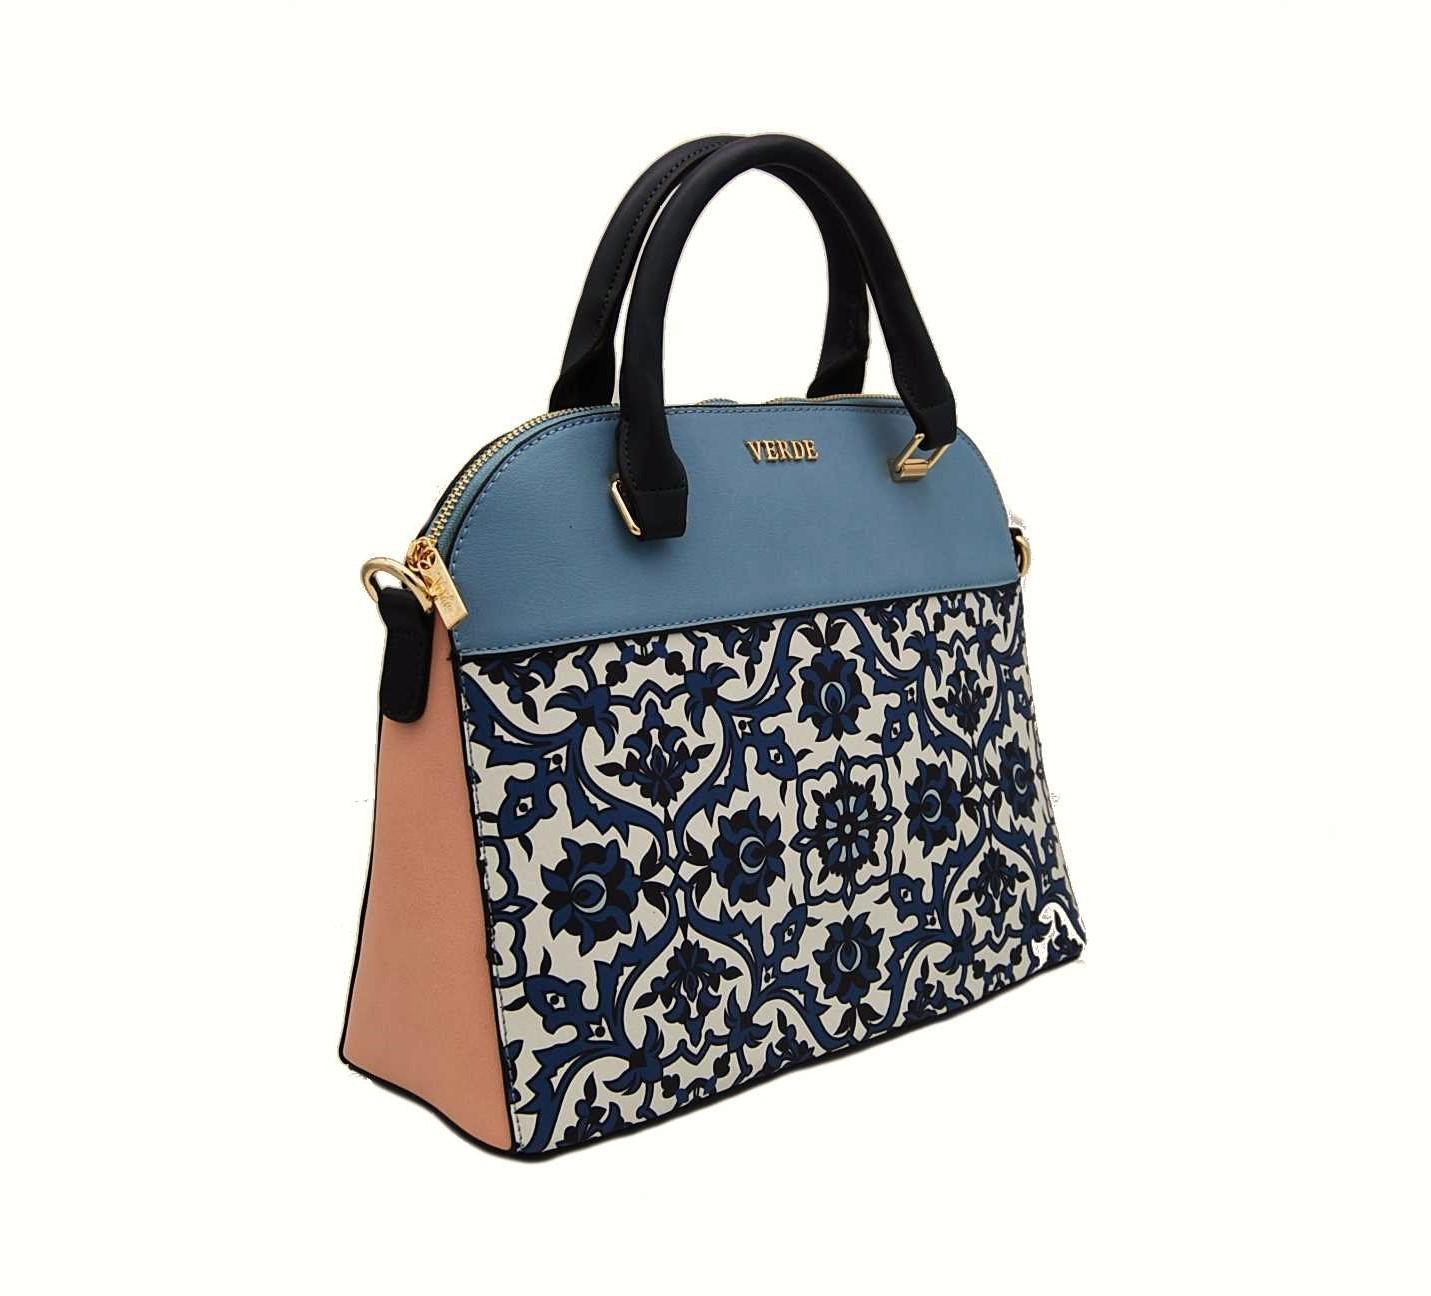 c09c9fa25b Verde τσάντα γυναικεία χιαστί και χεριού μπλε